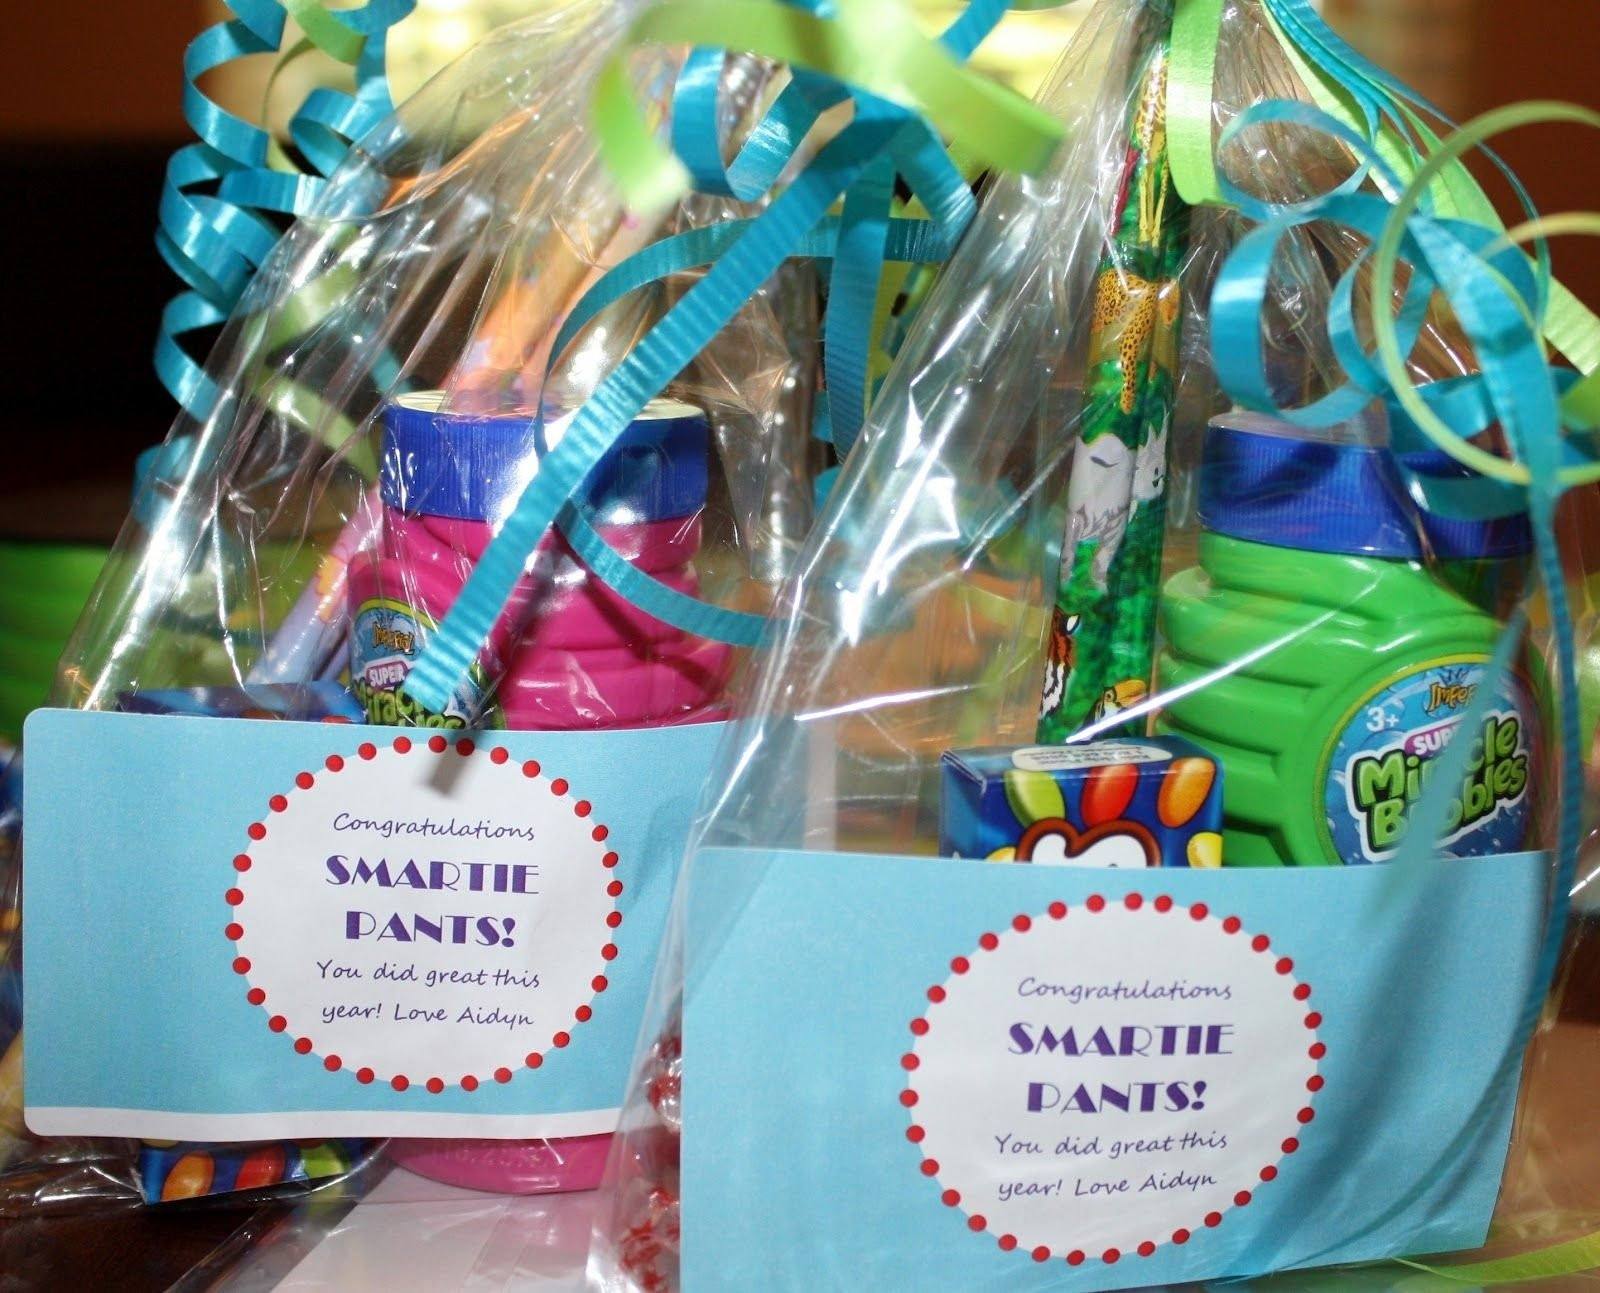 Elementary School Graduation Gift Ideas  10 Lovely Elementary School Graduation Gift Ideas 2020